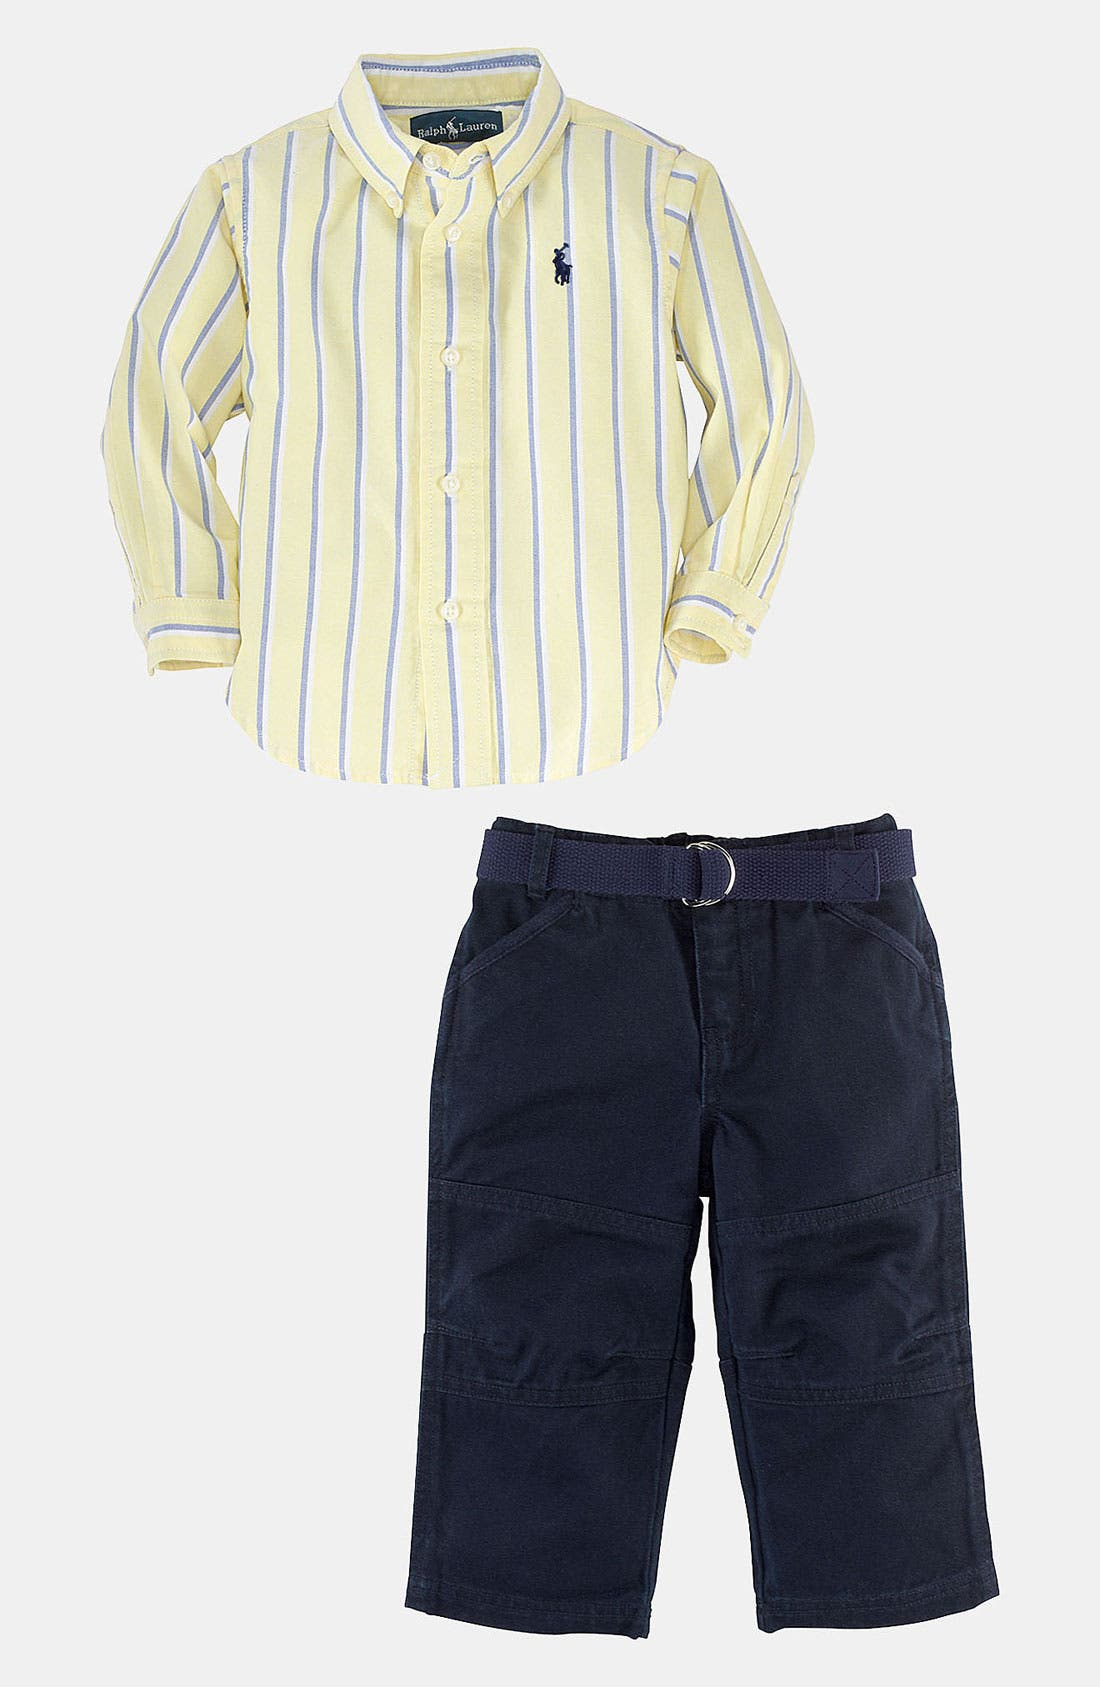 Alternate Image 1 Selected - Ralph Lauren Stripe Shirt & Pants (Baby)